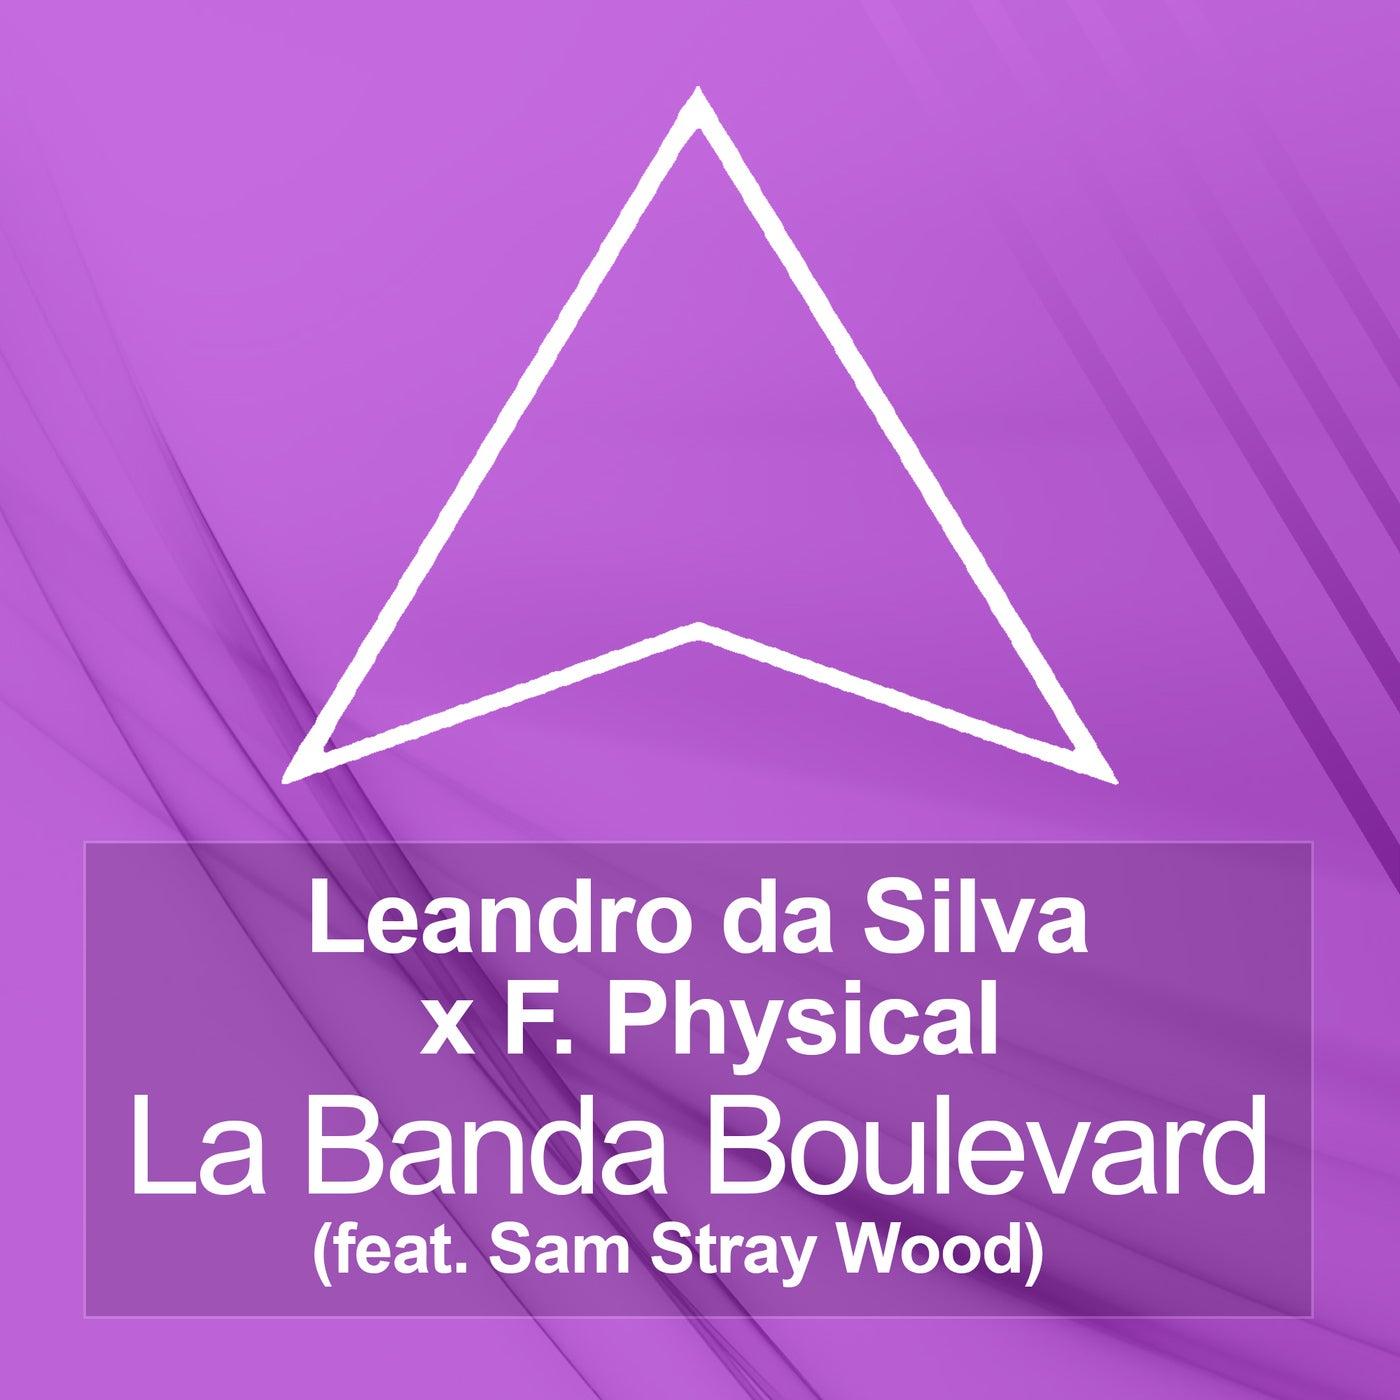 La Banda Boulevard (feat. Sam Stray Wood) (Extended Mix)